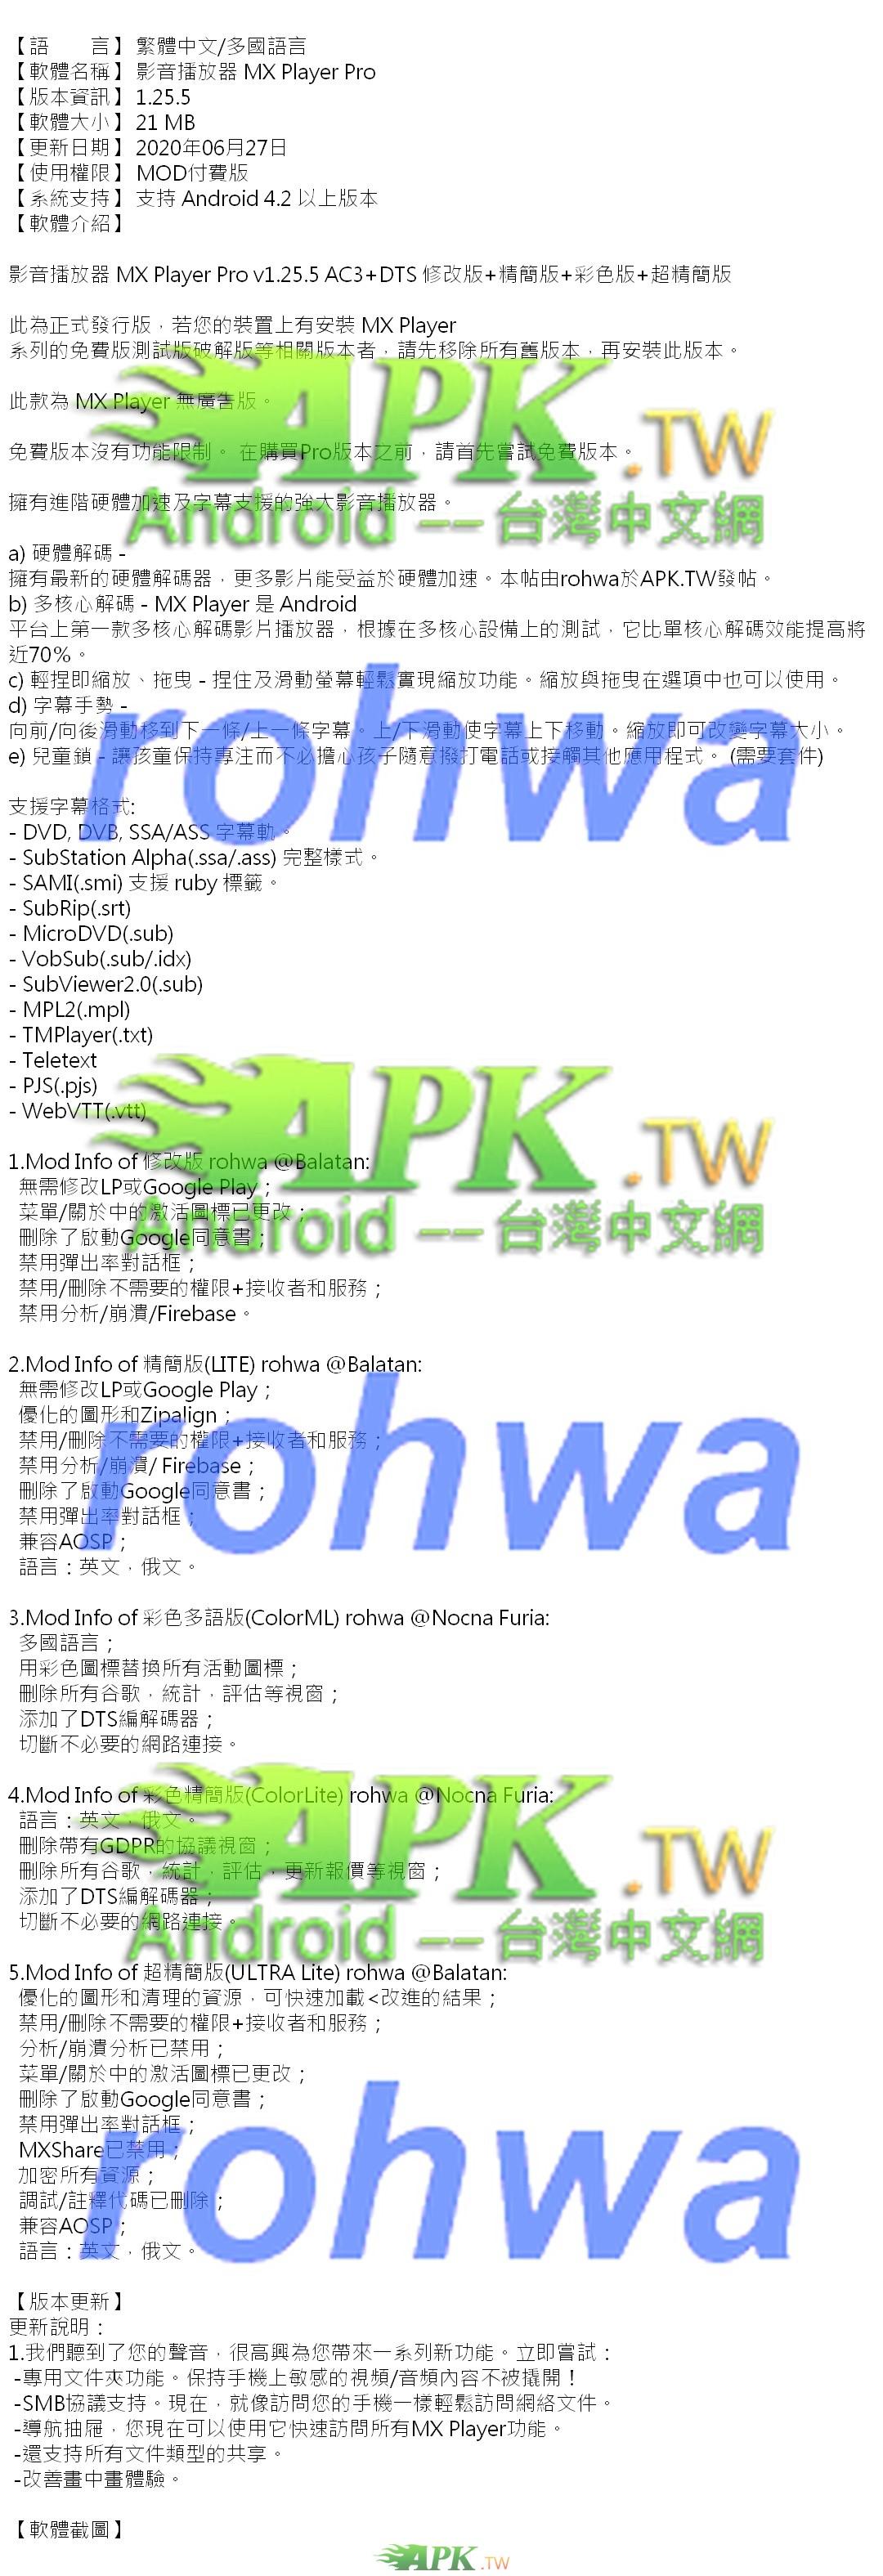 MX_Player_Pro_1.25.5 APK_Add_ULTRA_Lite_.jpg